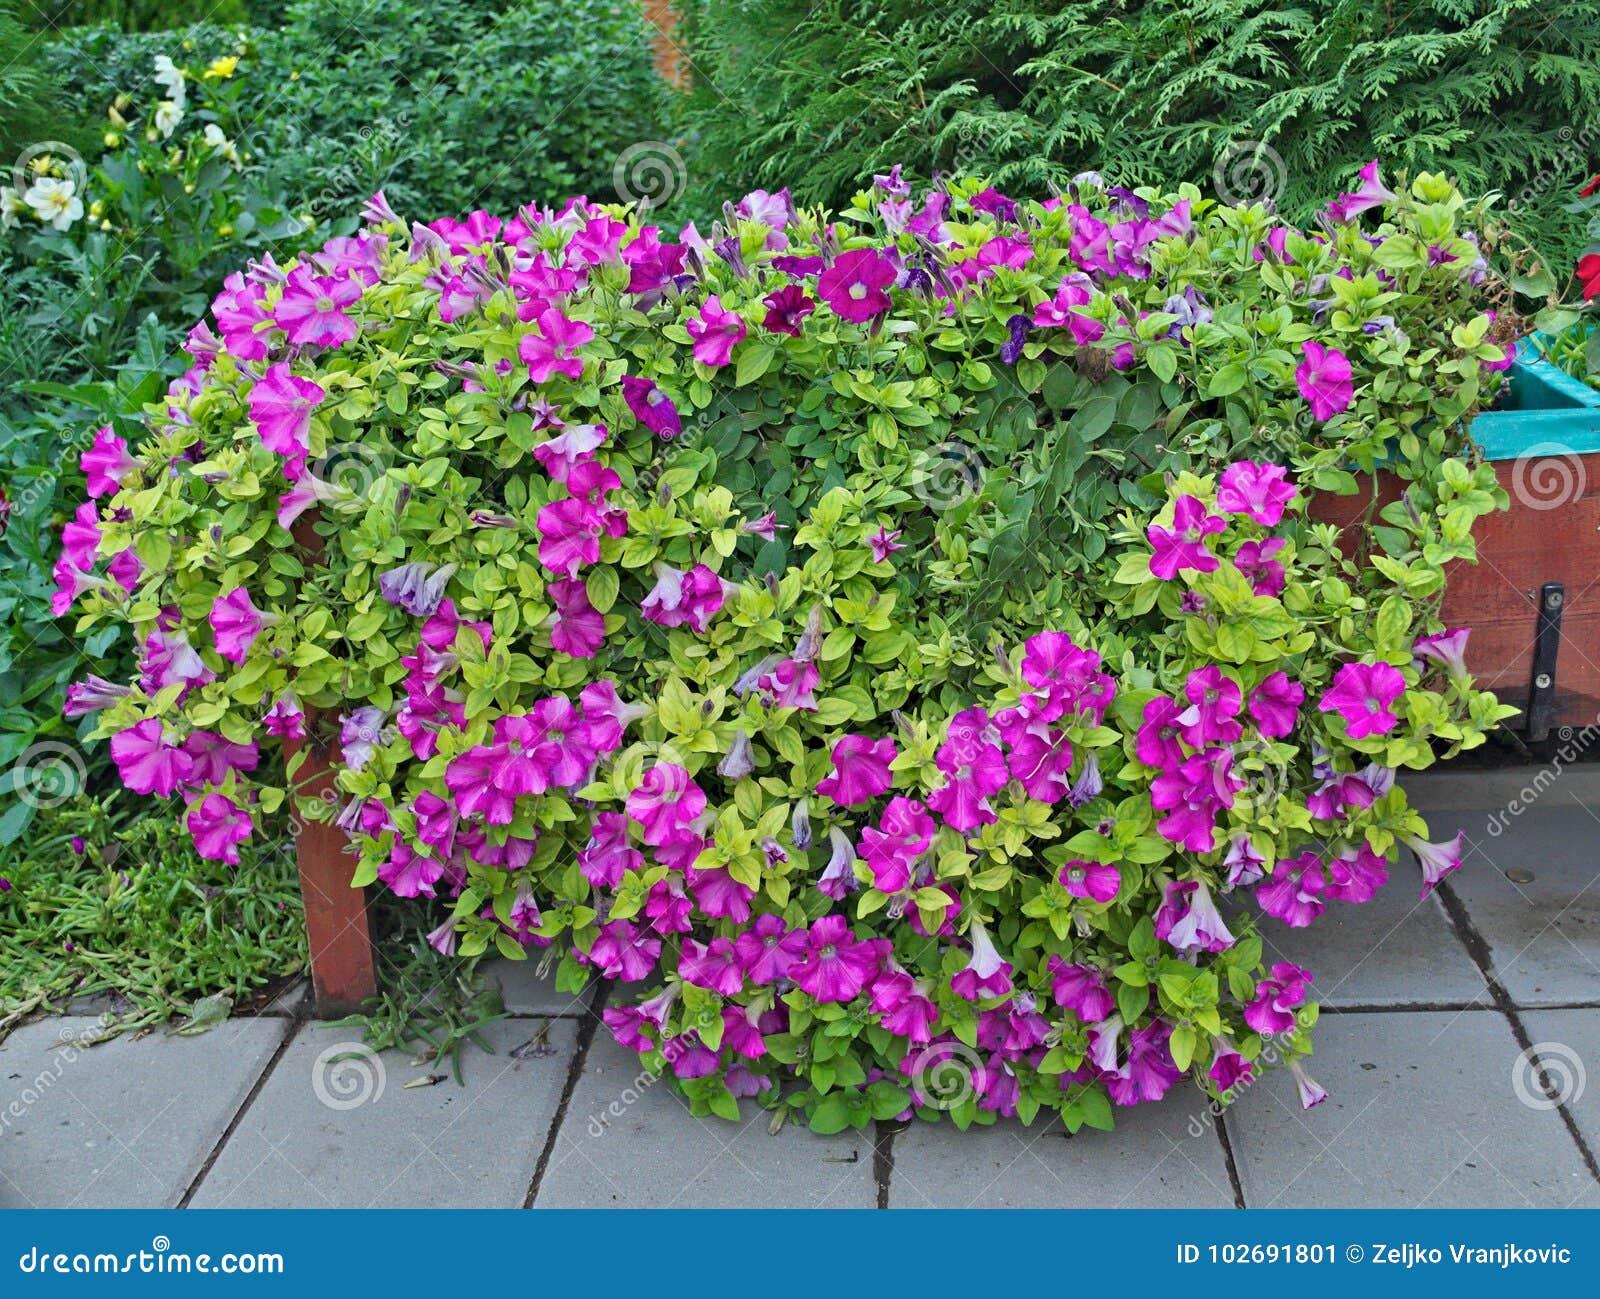 Abundance Of Plants With Purple Flowers In Big Pot Outdoor Stock